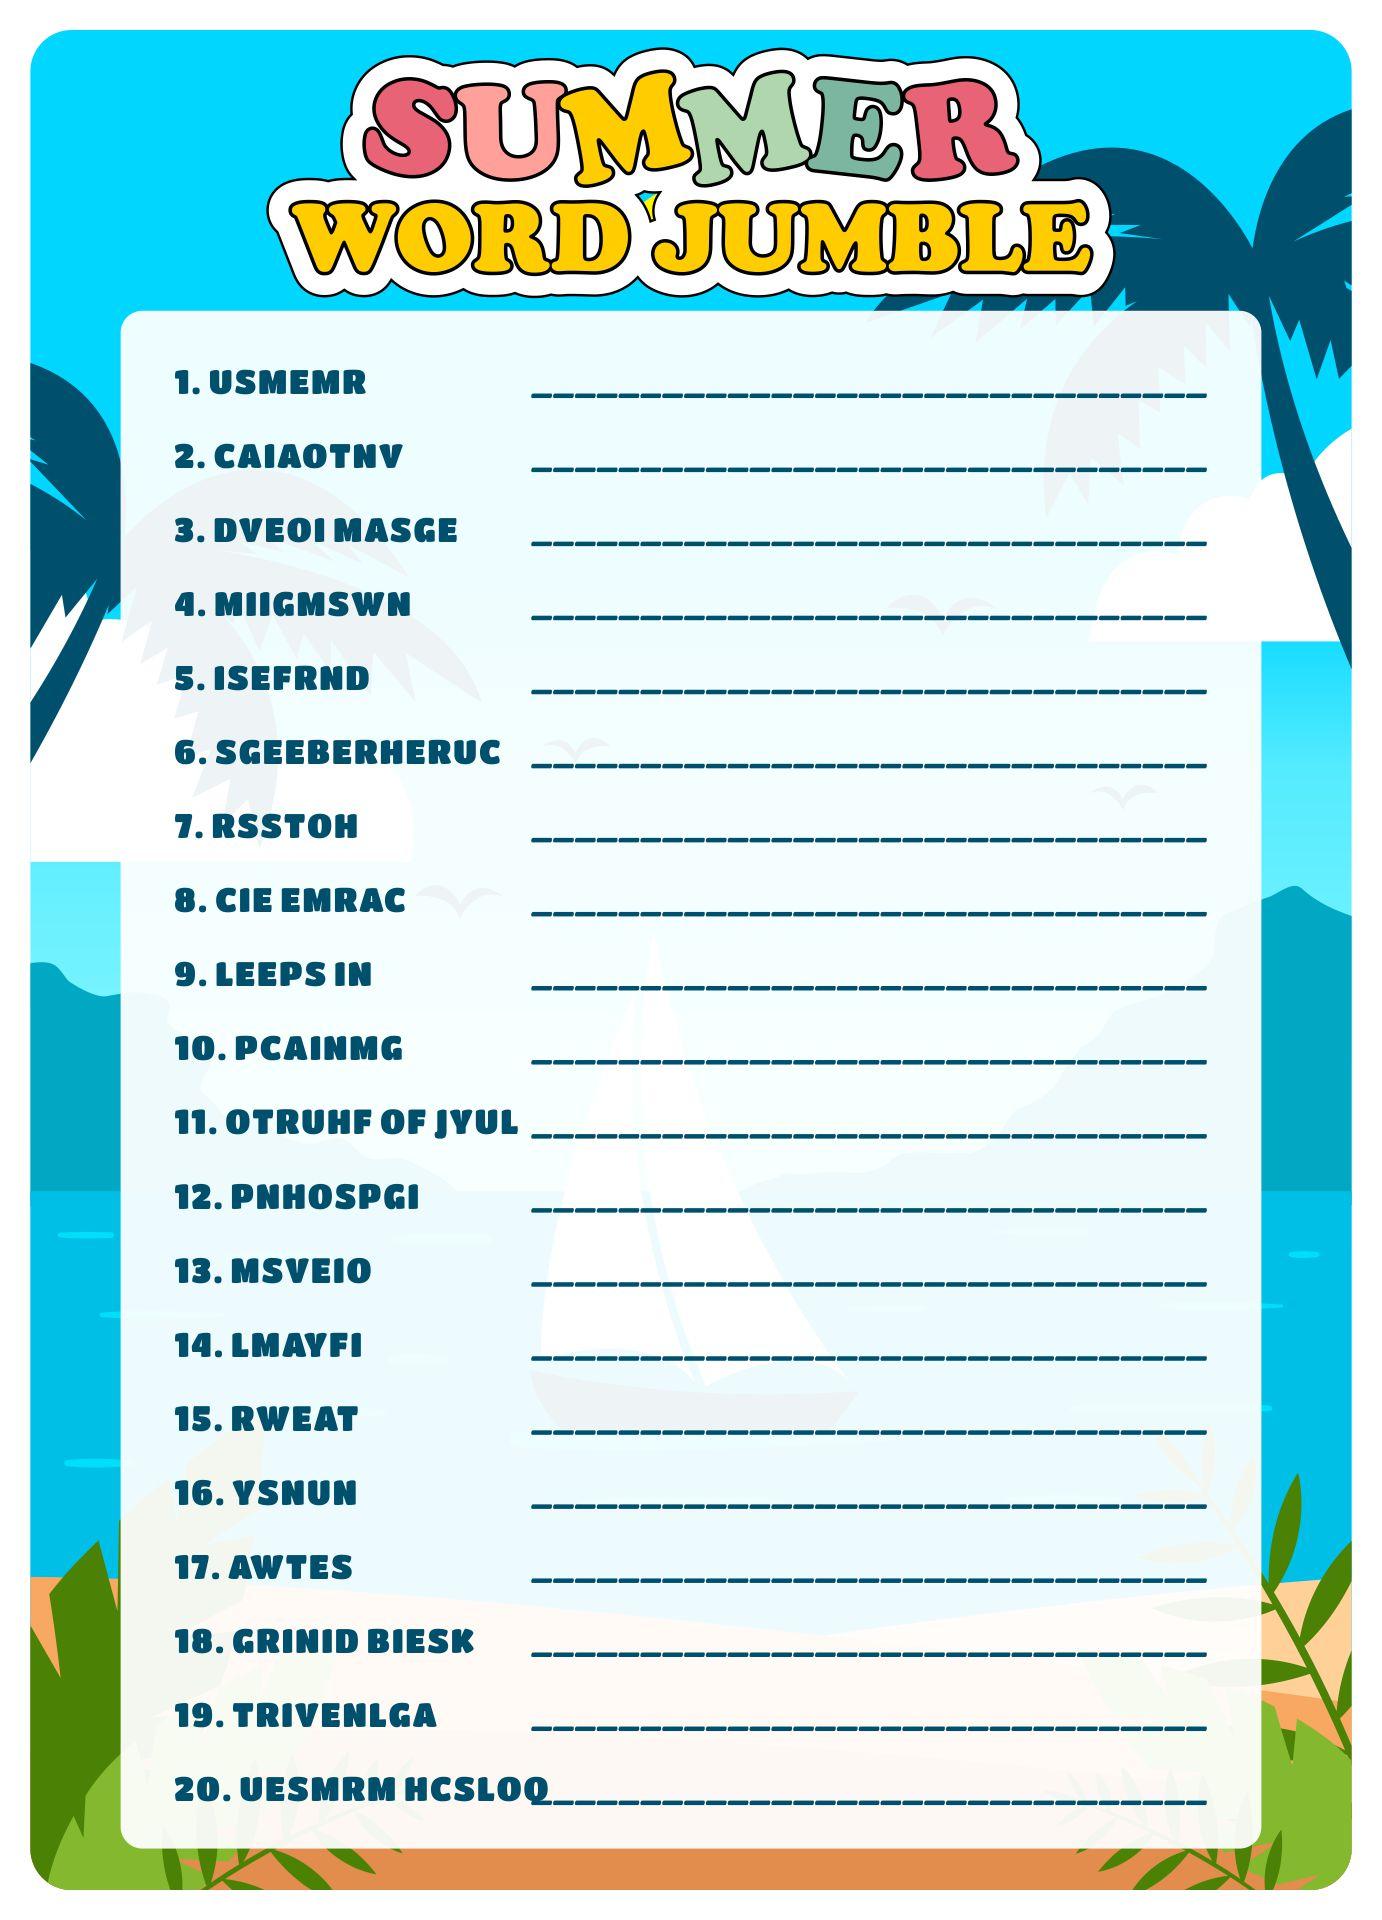 Word Jumble Puzzles Printable